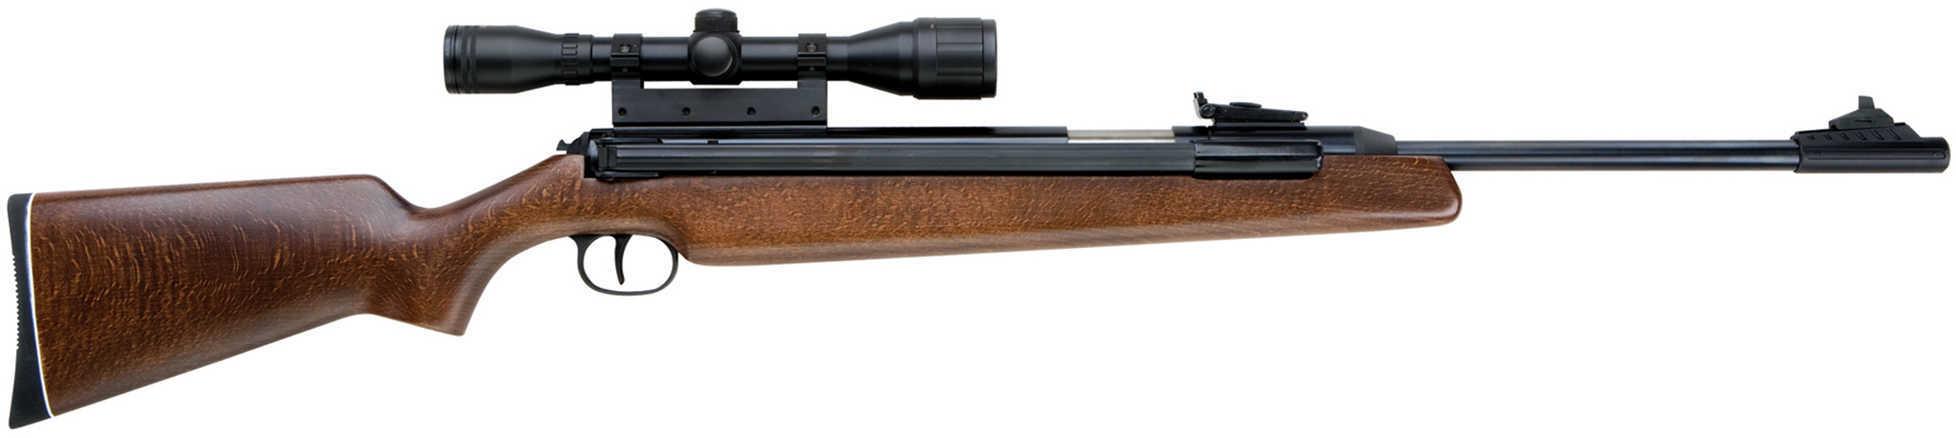 Umarex USA Model 48 .177 Caliber Combo Md: 216-6199